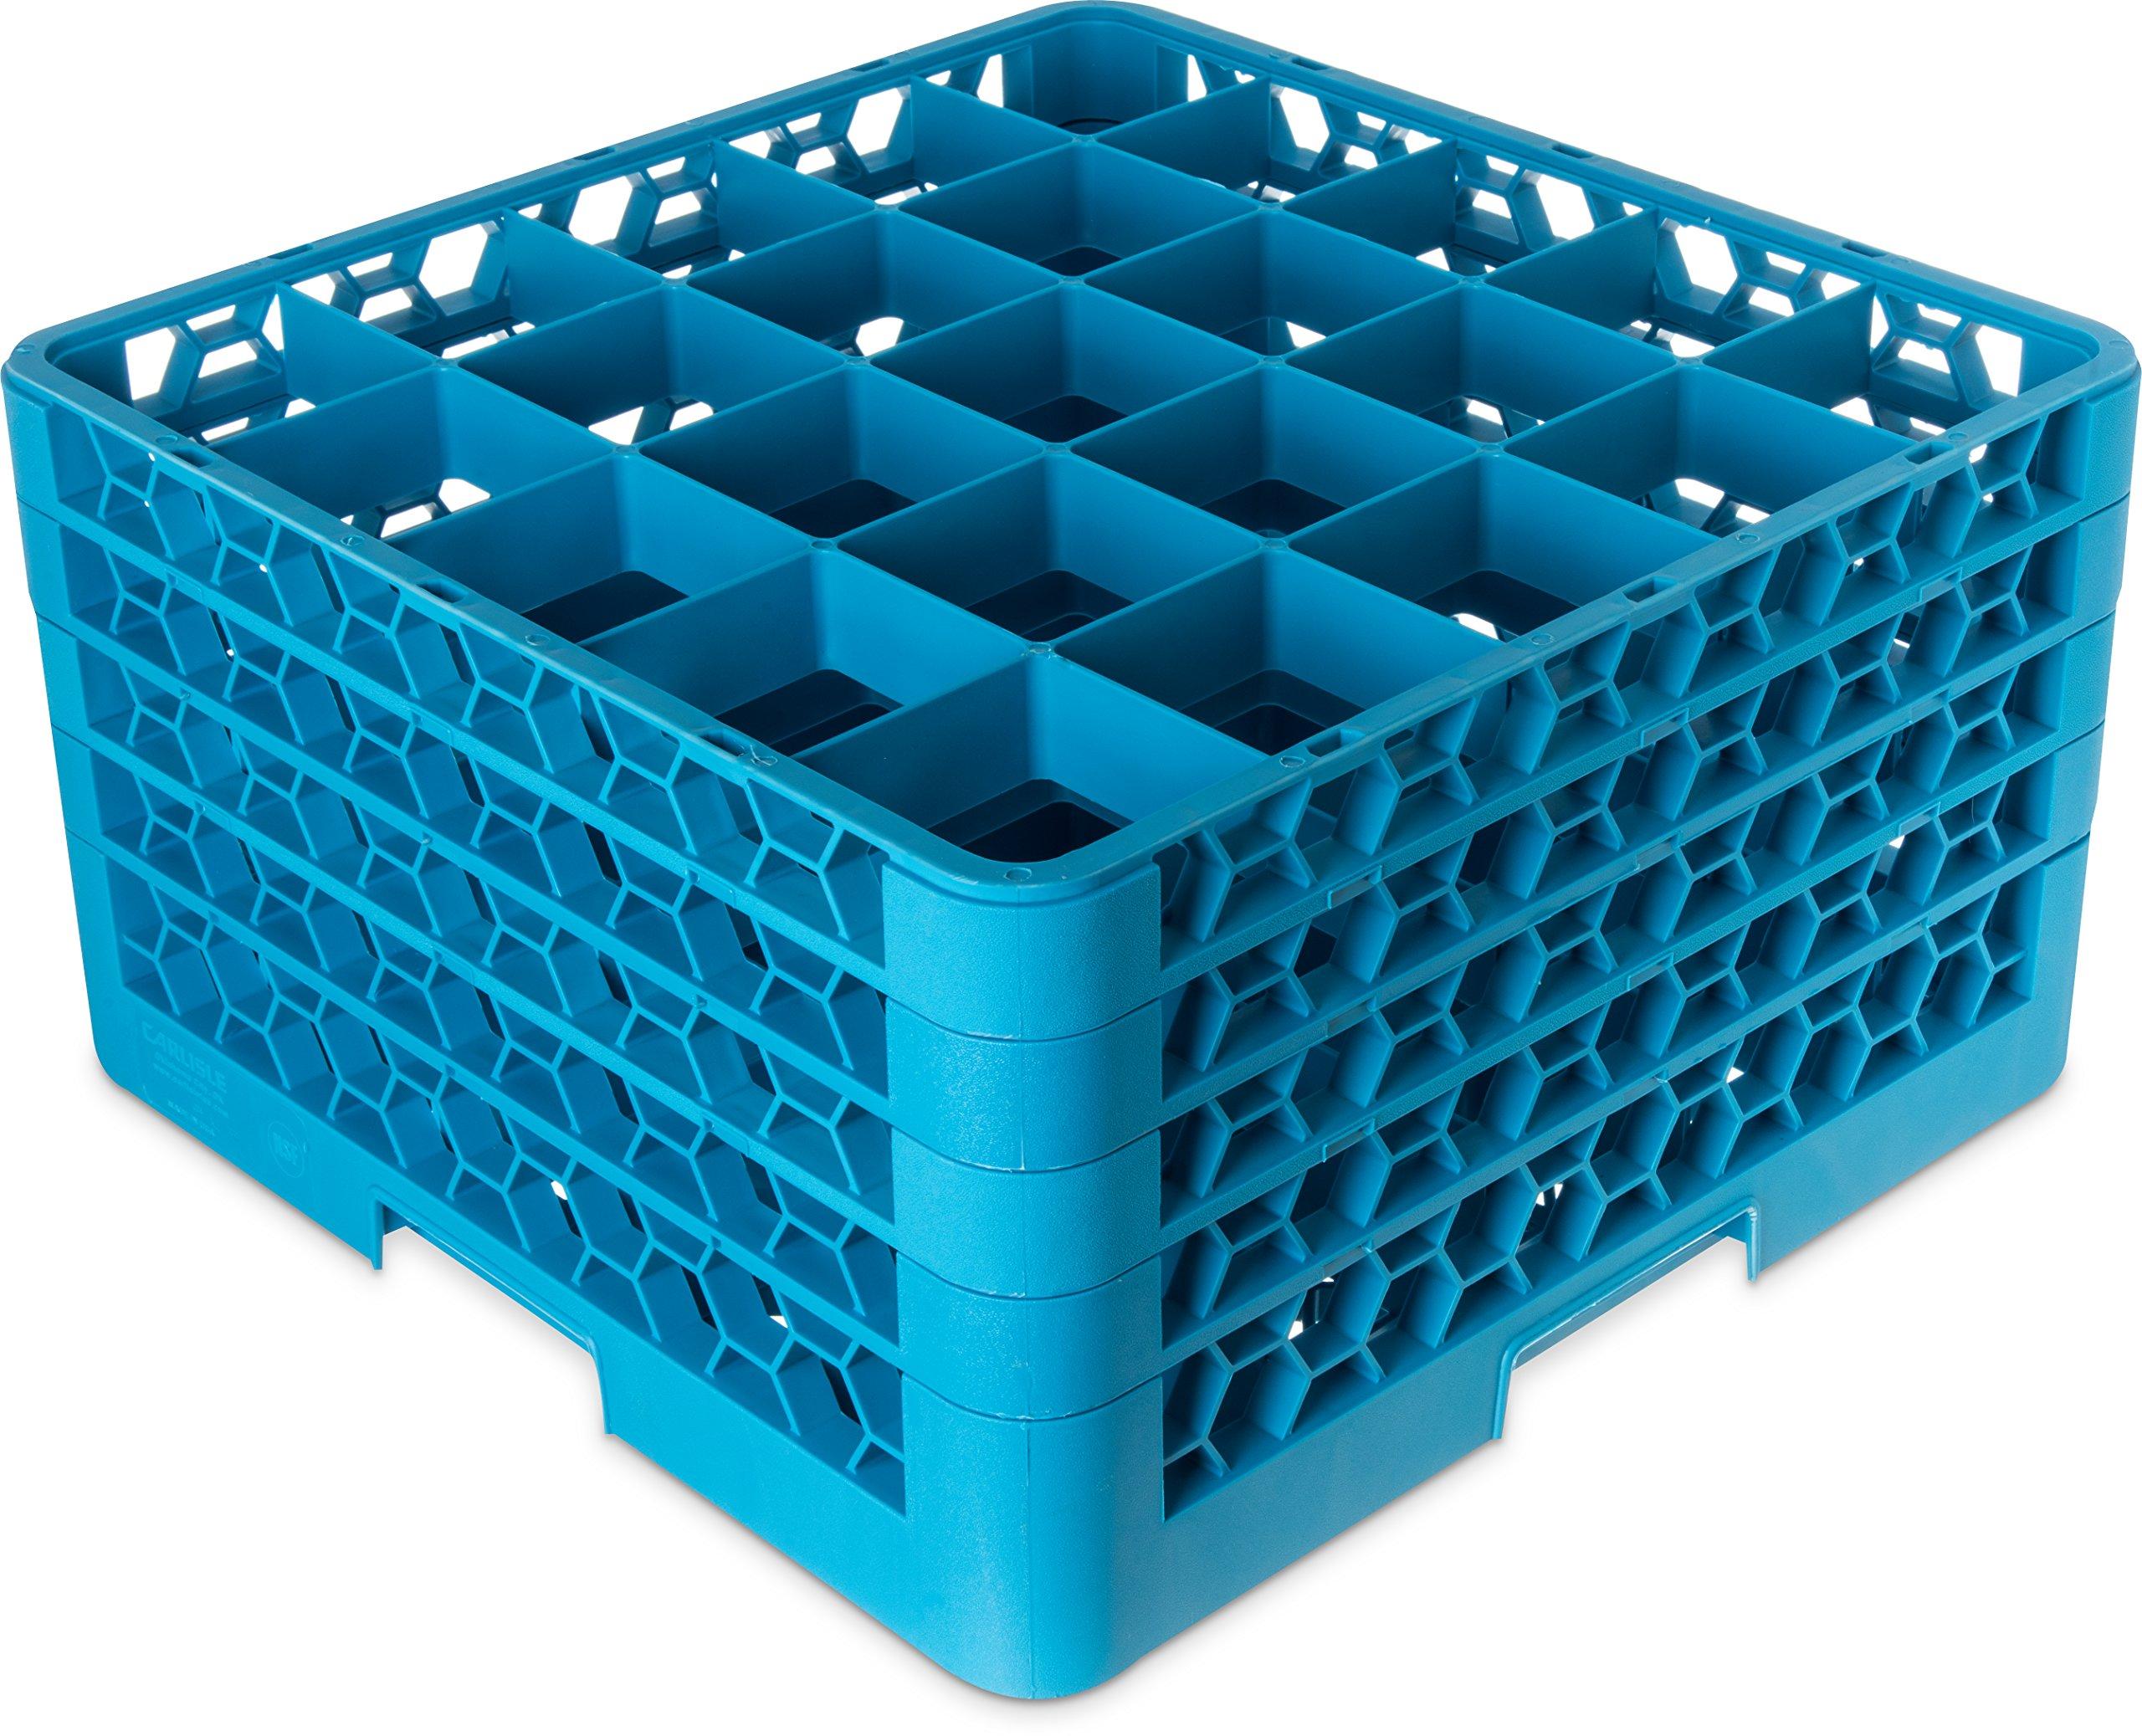 Carlisle RG9-314 OptiClean 9-Compartment Glass Rack w/ 3 Extenders, Polypropylene, 20.88'' Length, 20.88'' Width, 8.72'' Height, Blue